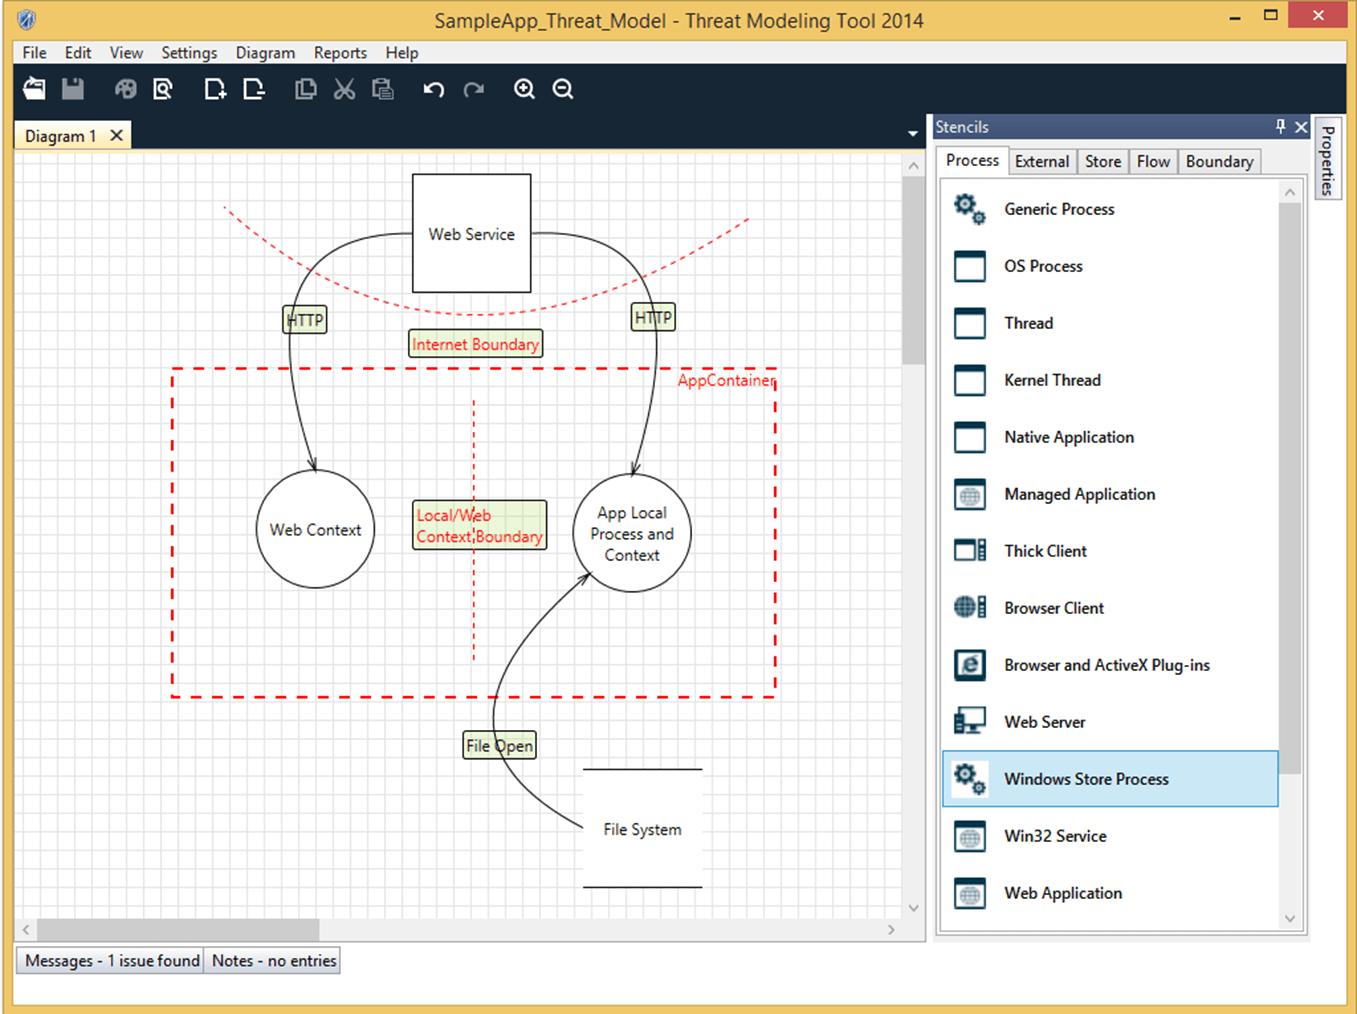 Introducing Microsoft Threat Modeling Tool 2014